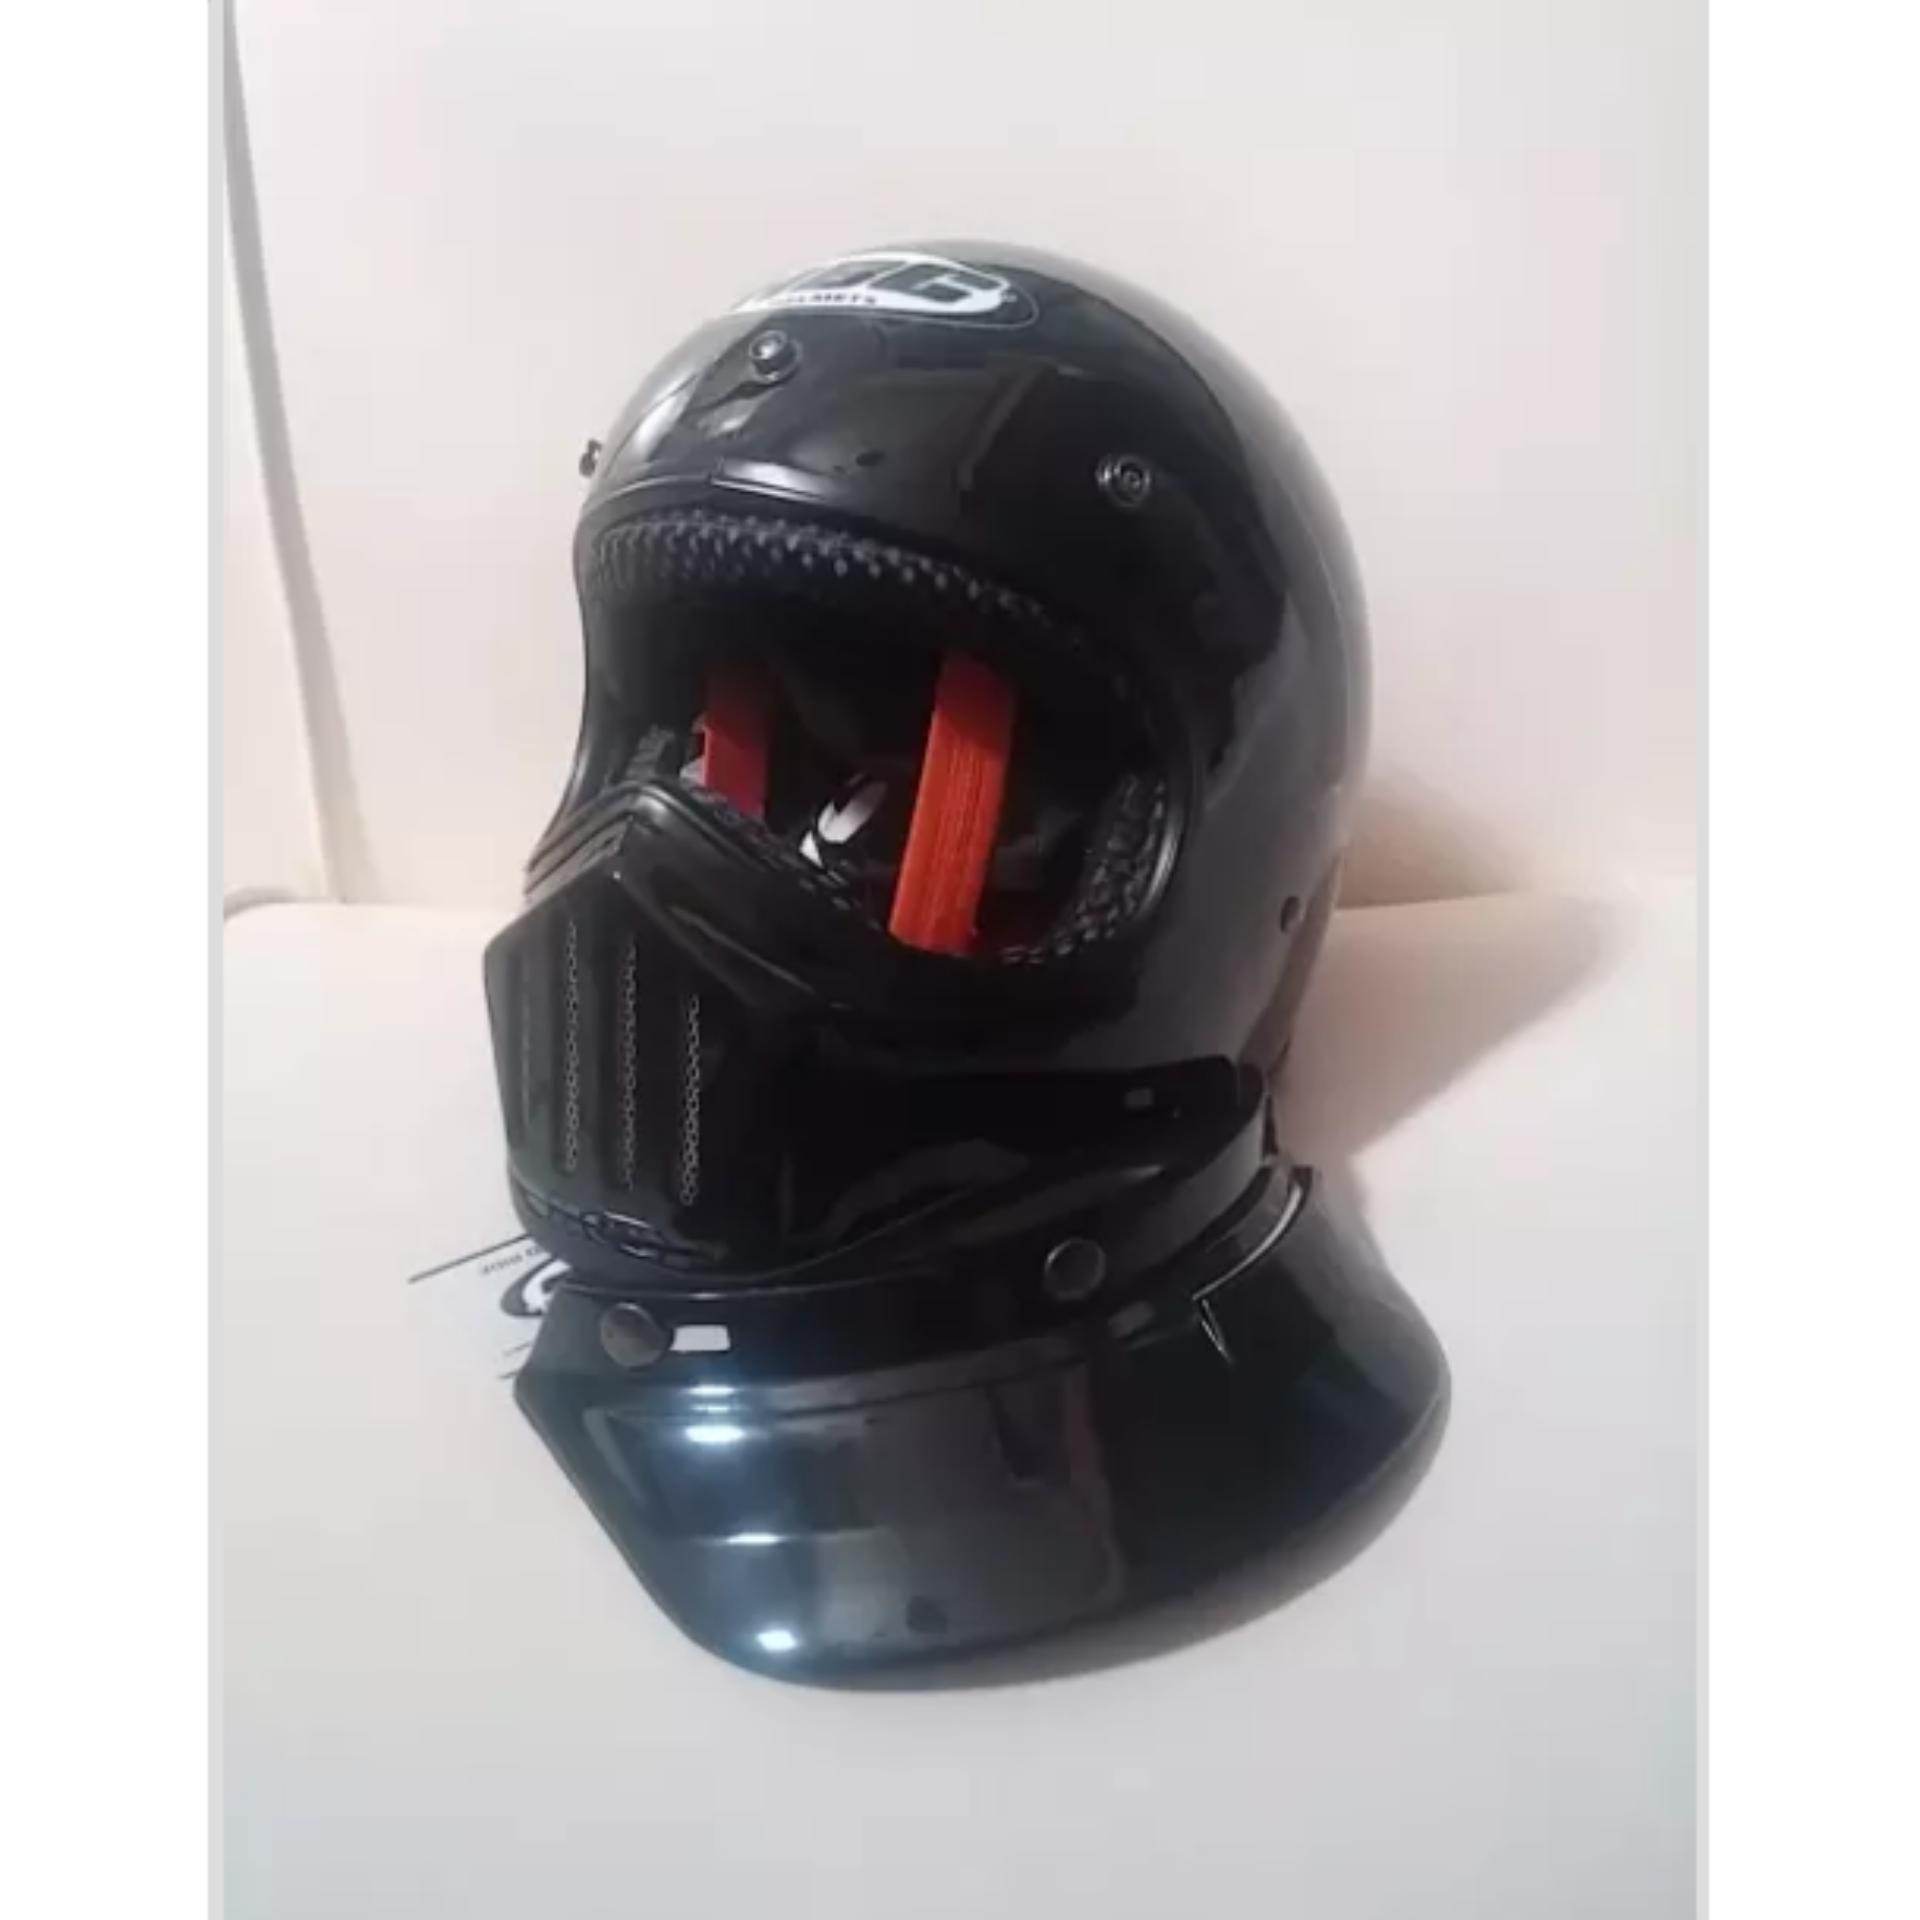 Helm Cakil Hbc Rust Dust Gading Motif Cream Size Ready S M L Xl Steve Legend Hitam Doff Glossy